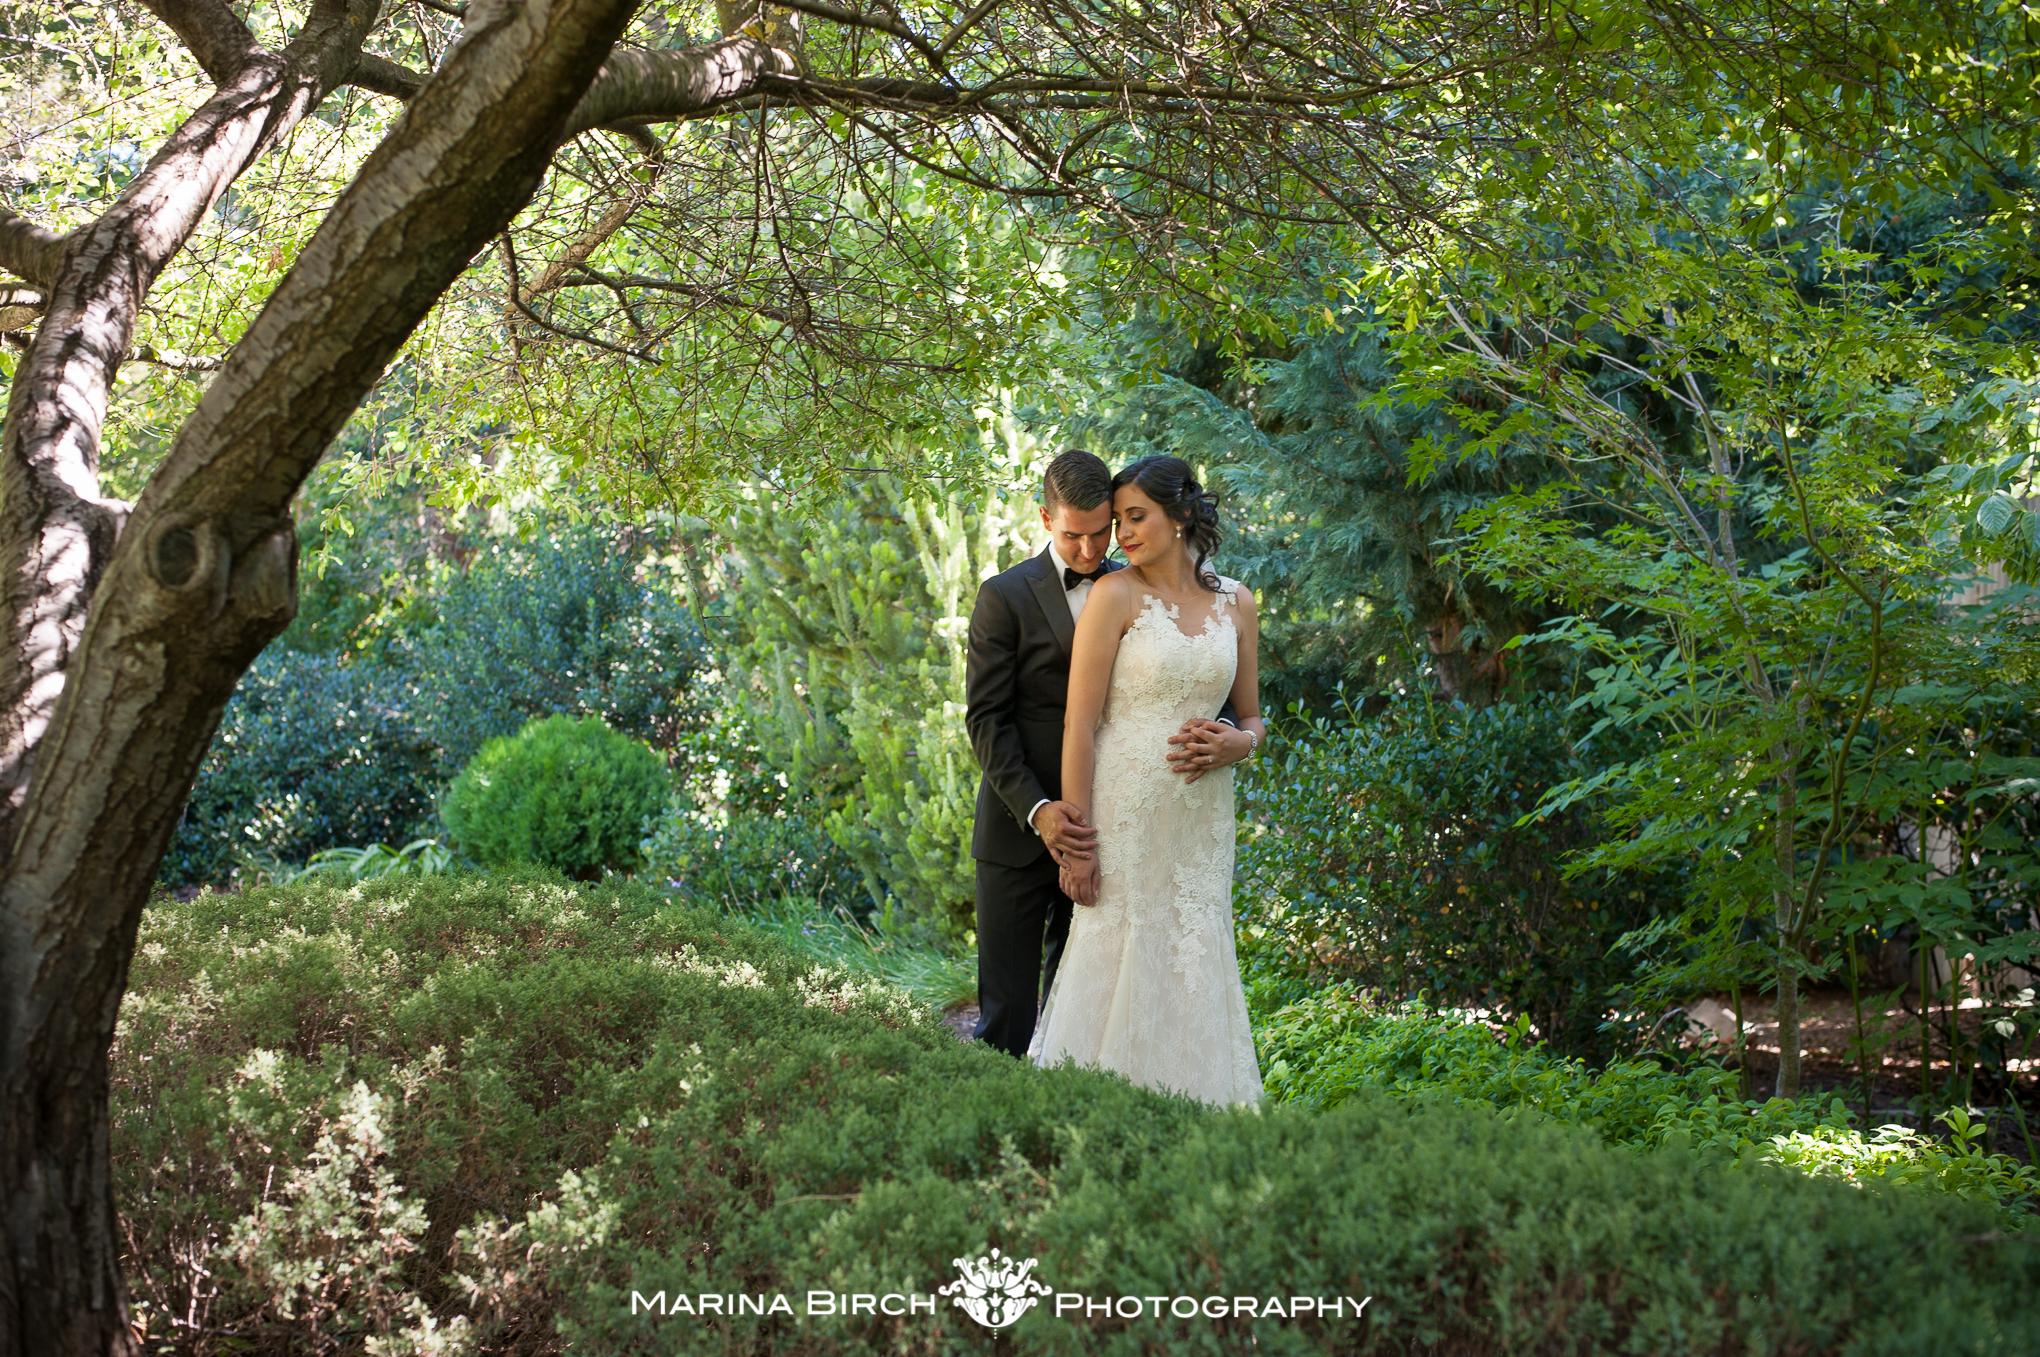 MBP.Lava wedding -23.jpg